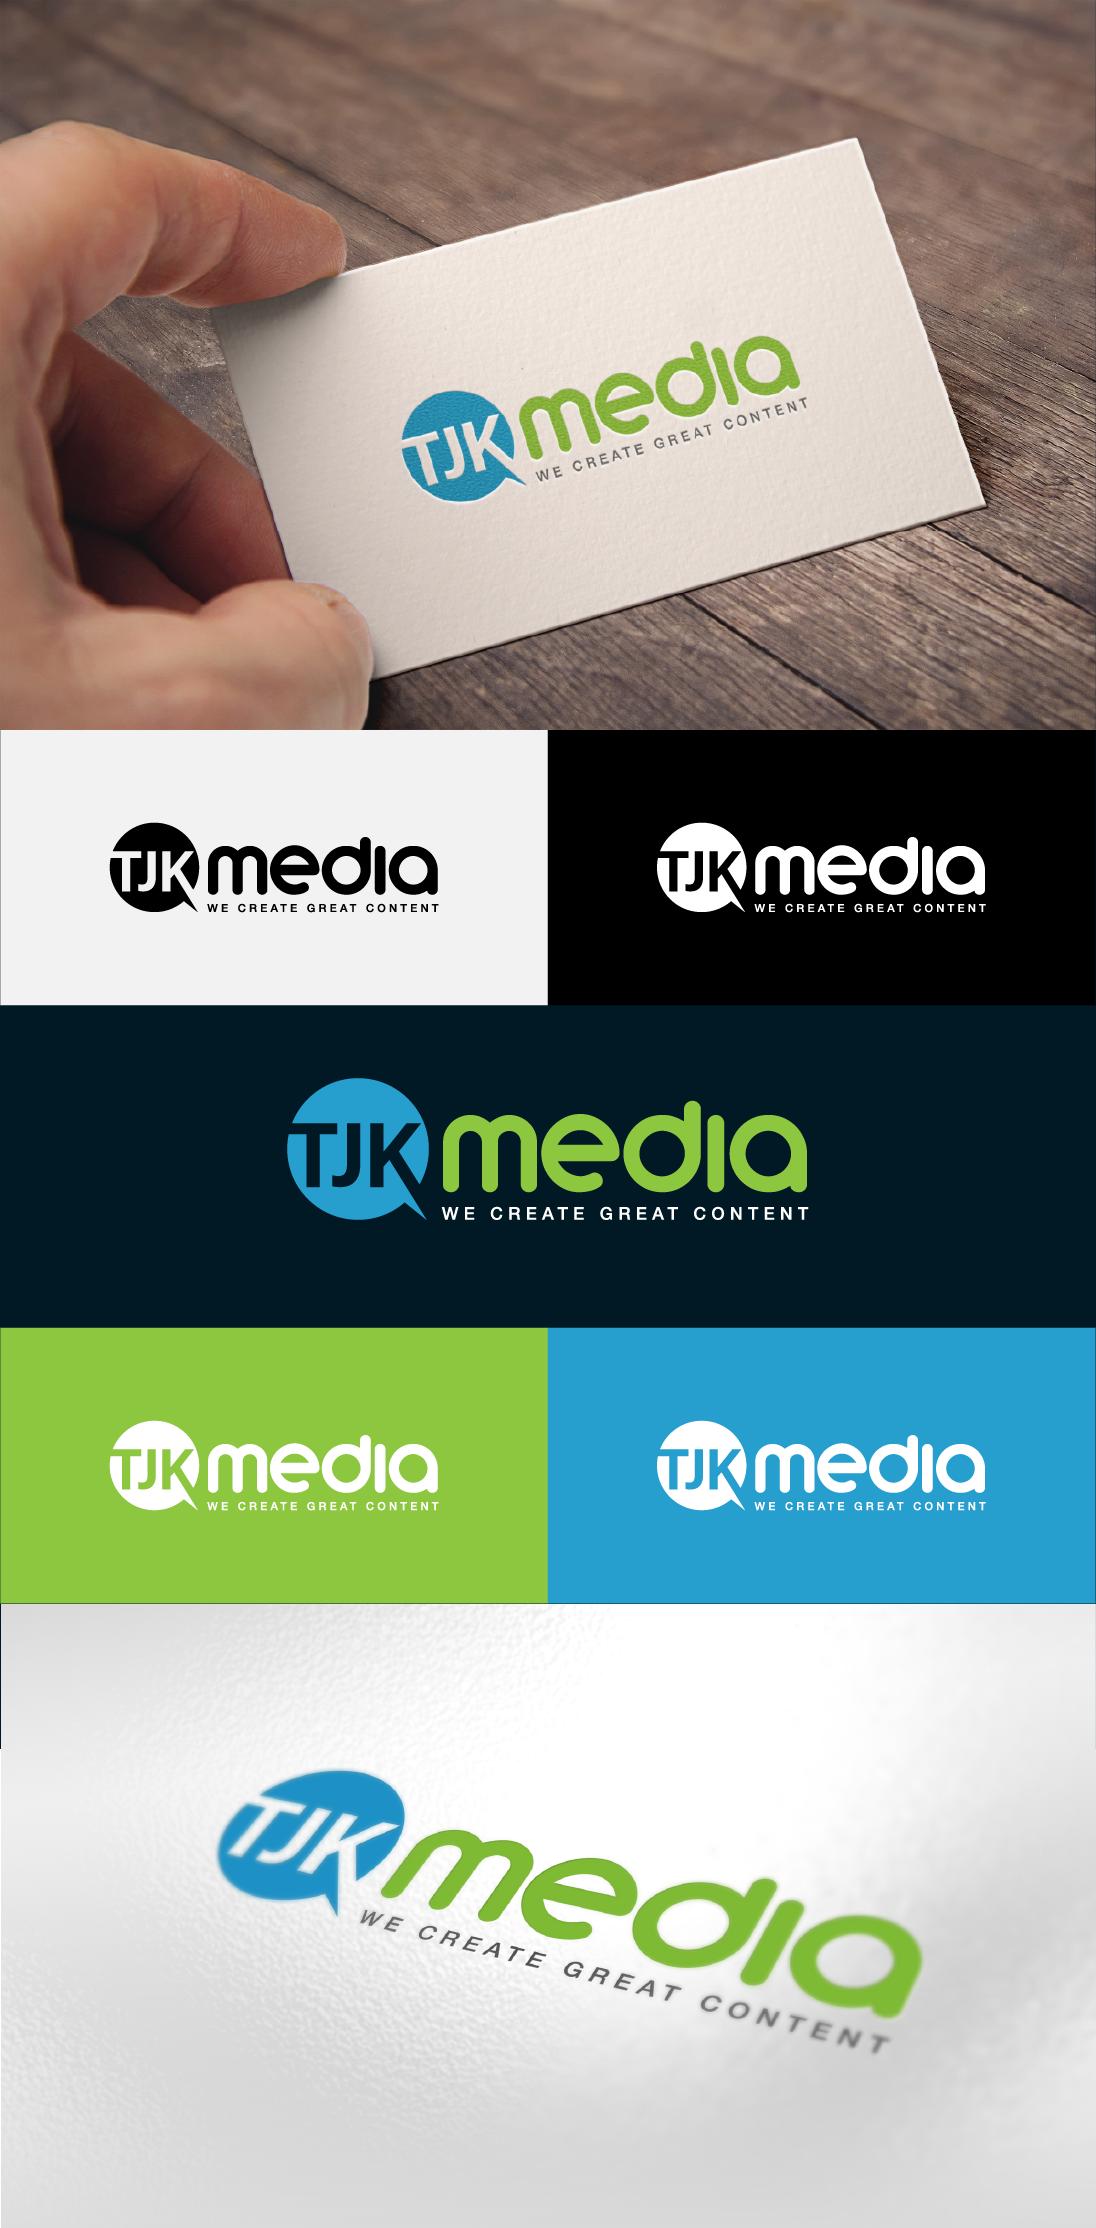 Next Generation Content & Media company logo - Guaranteed prize